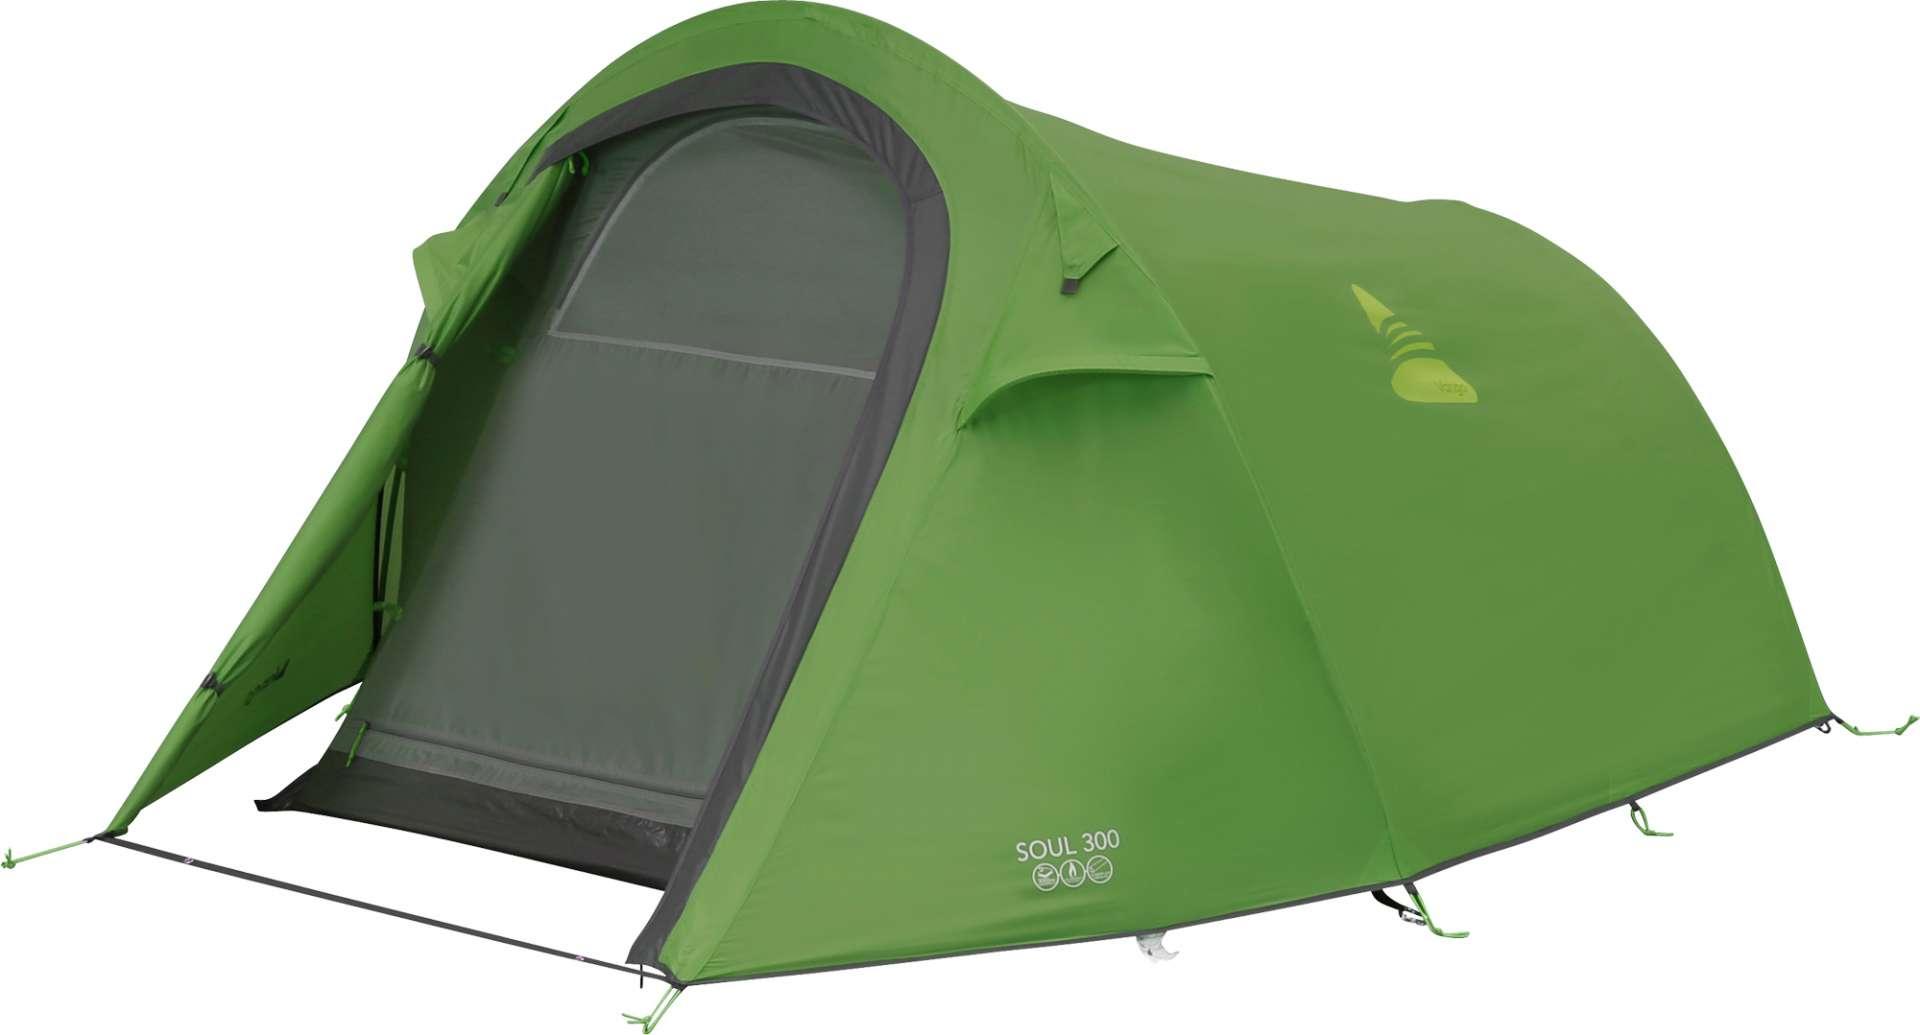 royalbeach campingschrank campingzubeh r. Black Bedroom Furniture Sets. Home Design Ideas